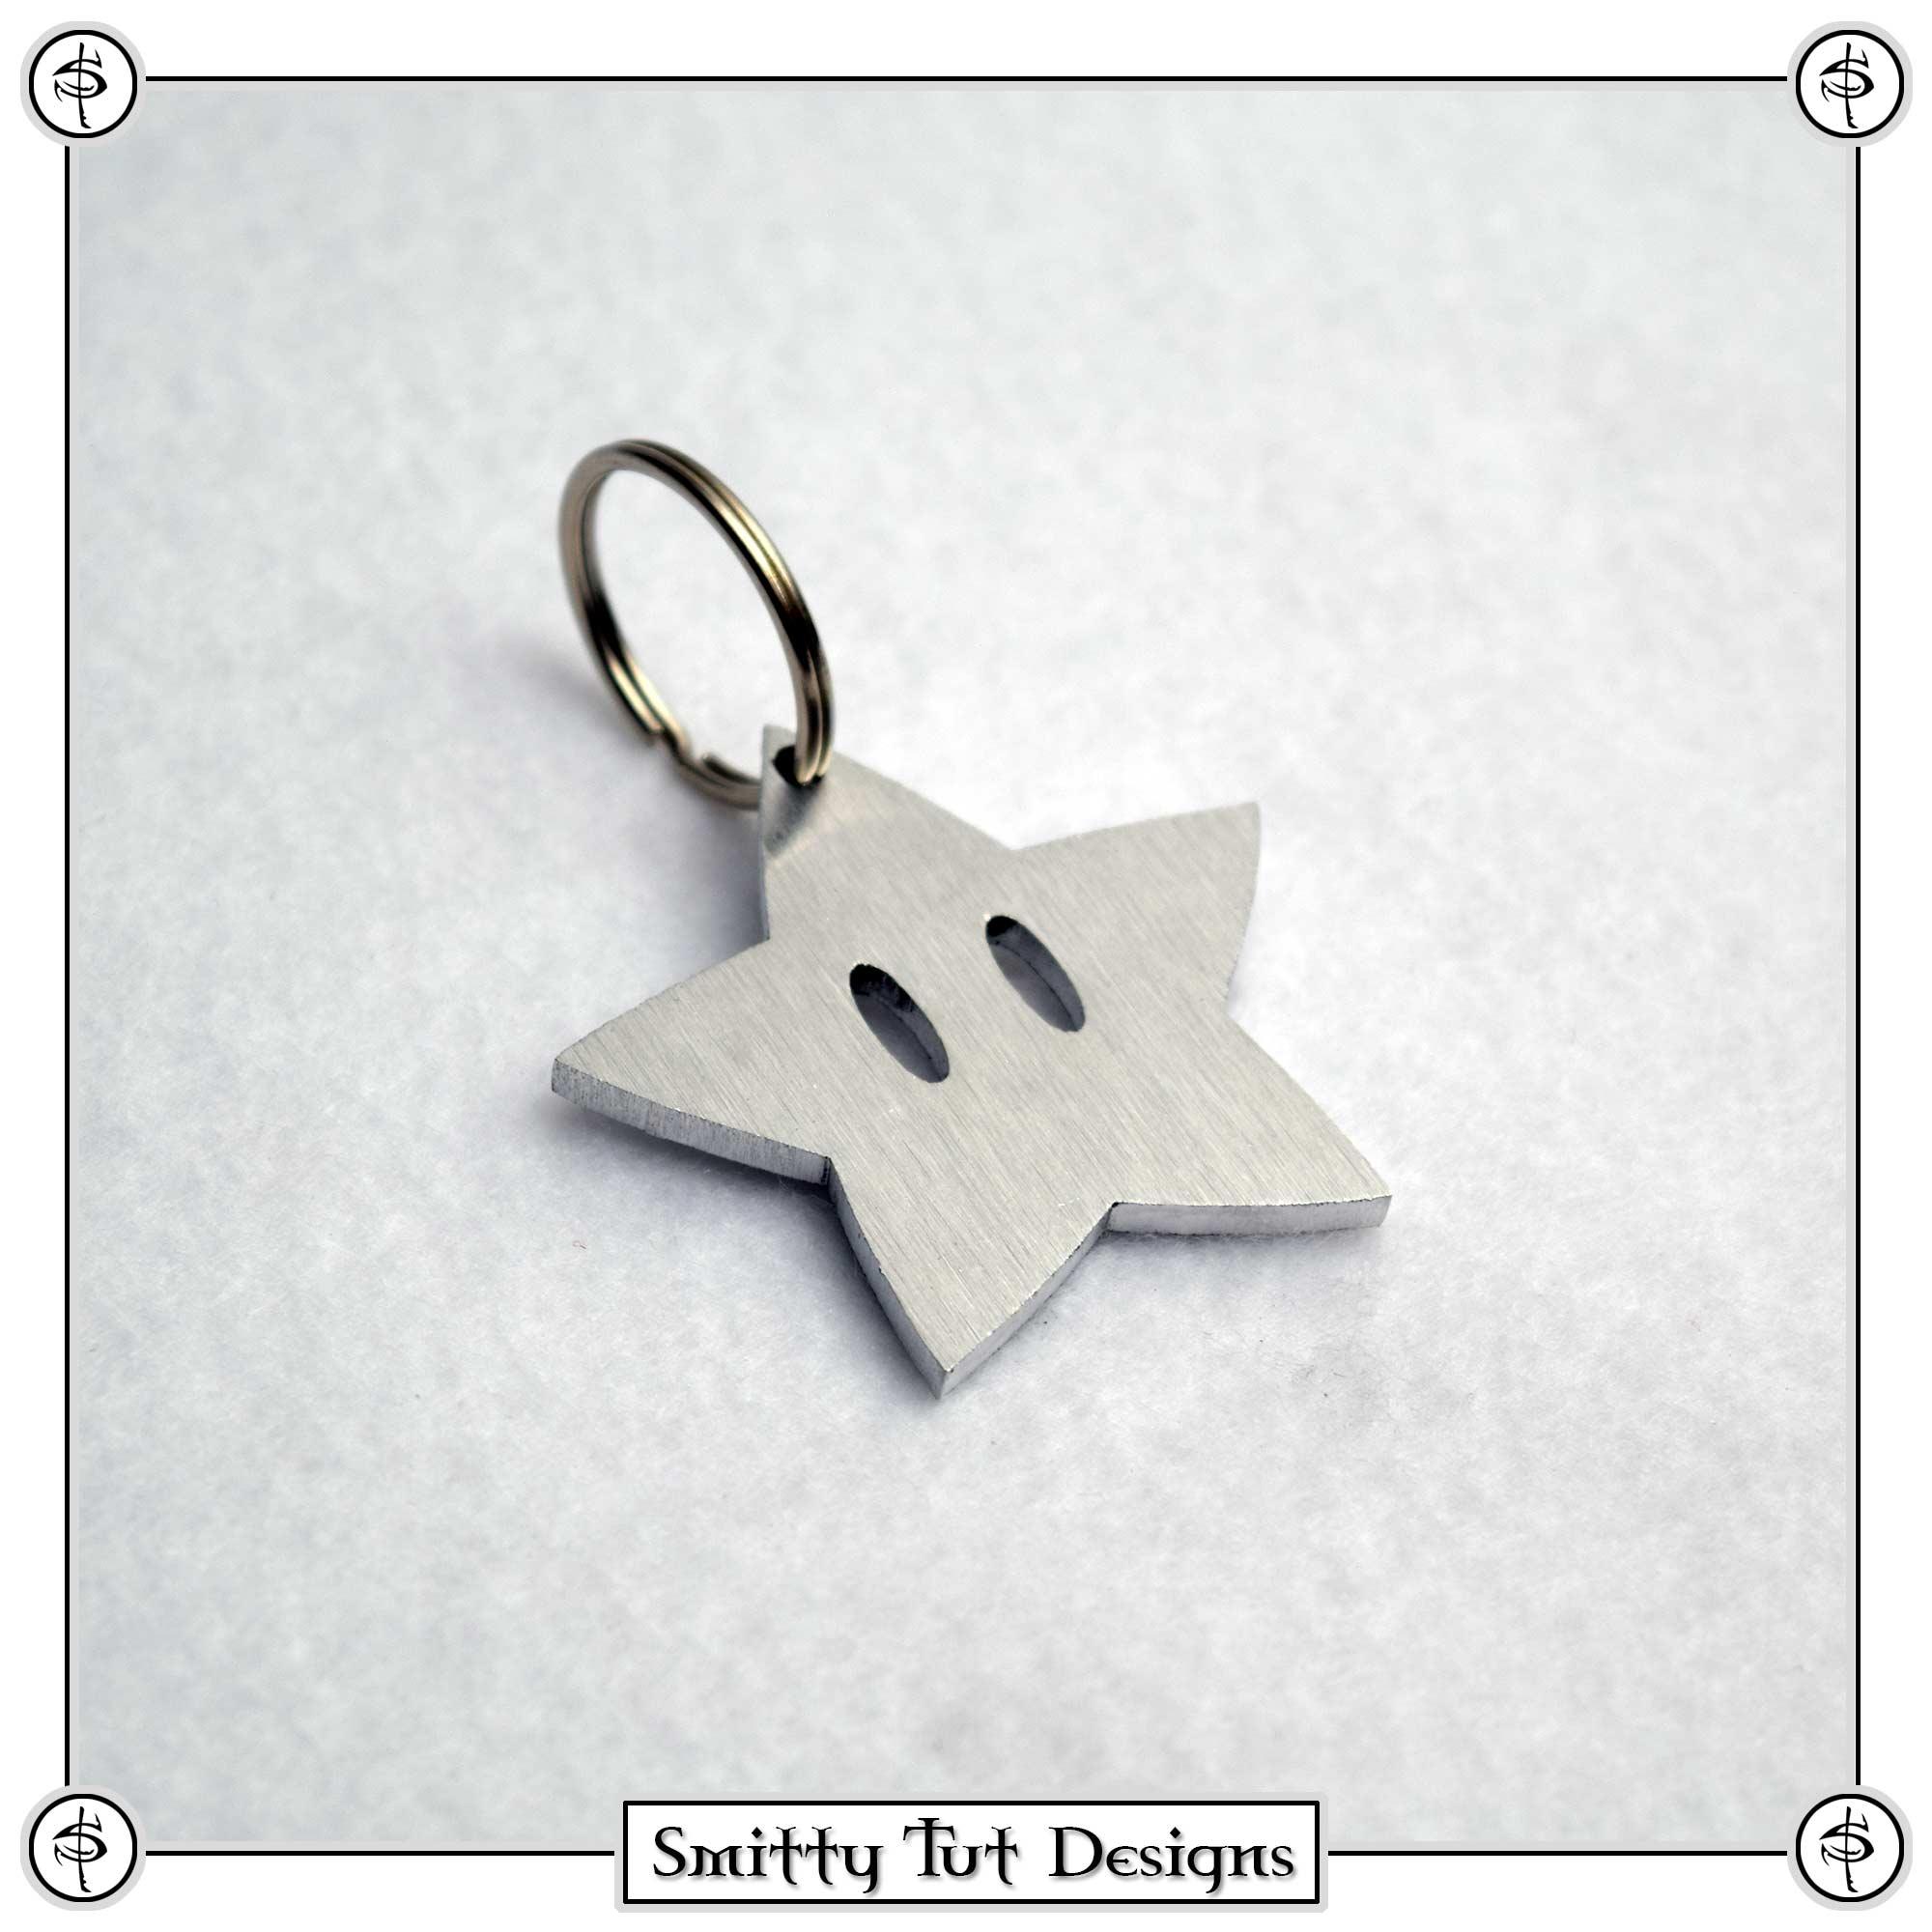 Star-Keychain